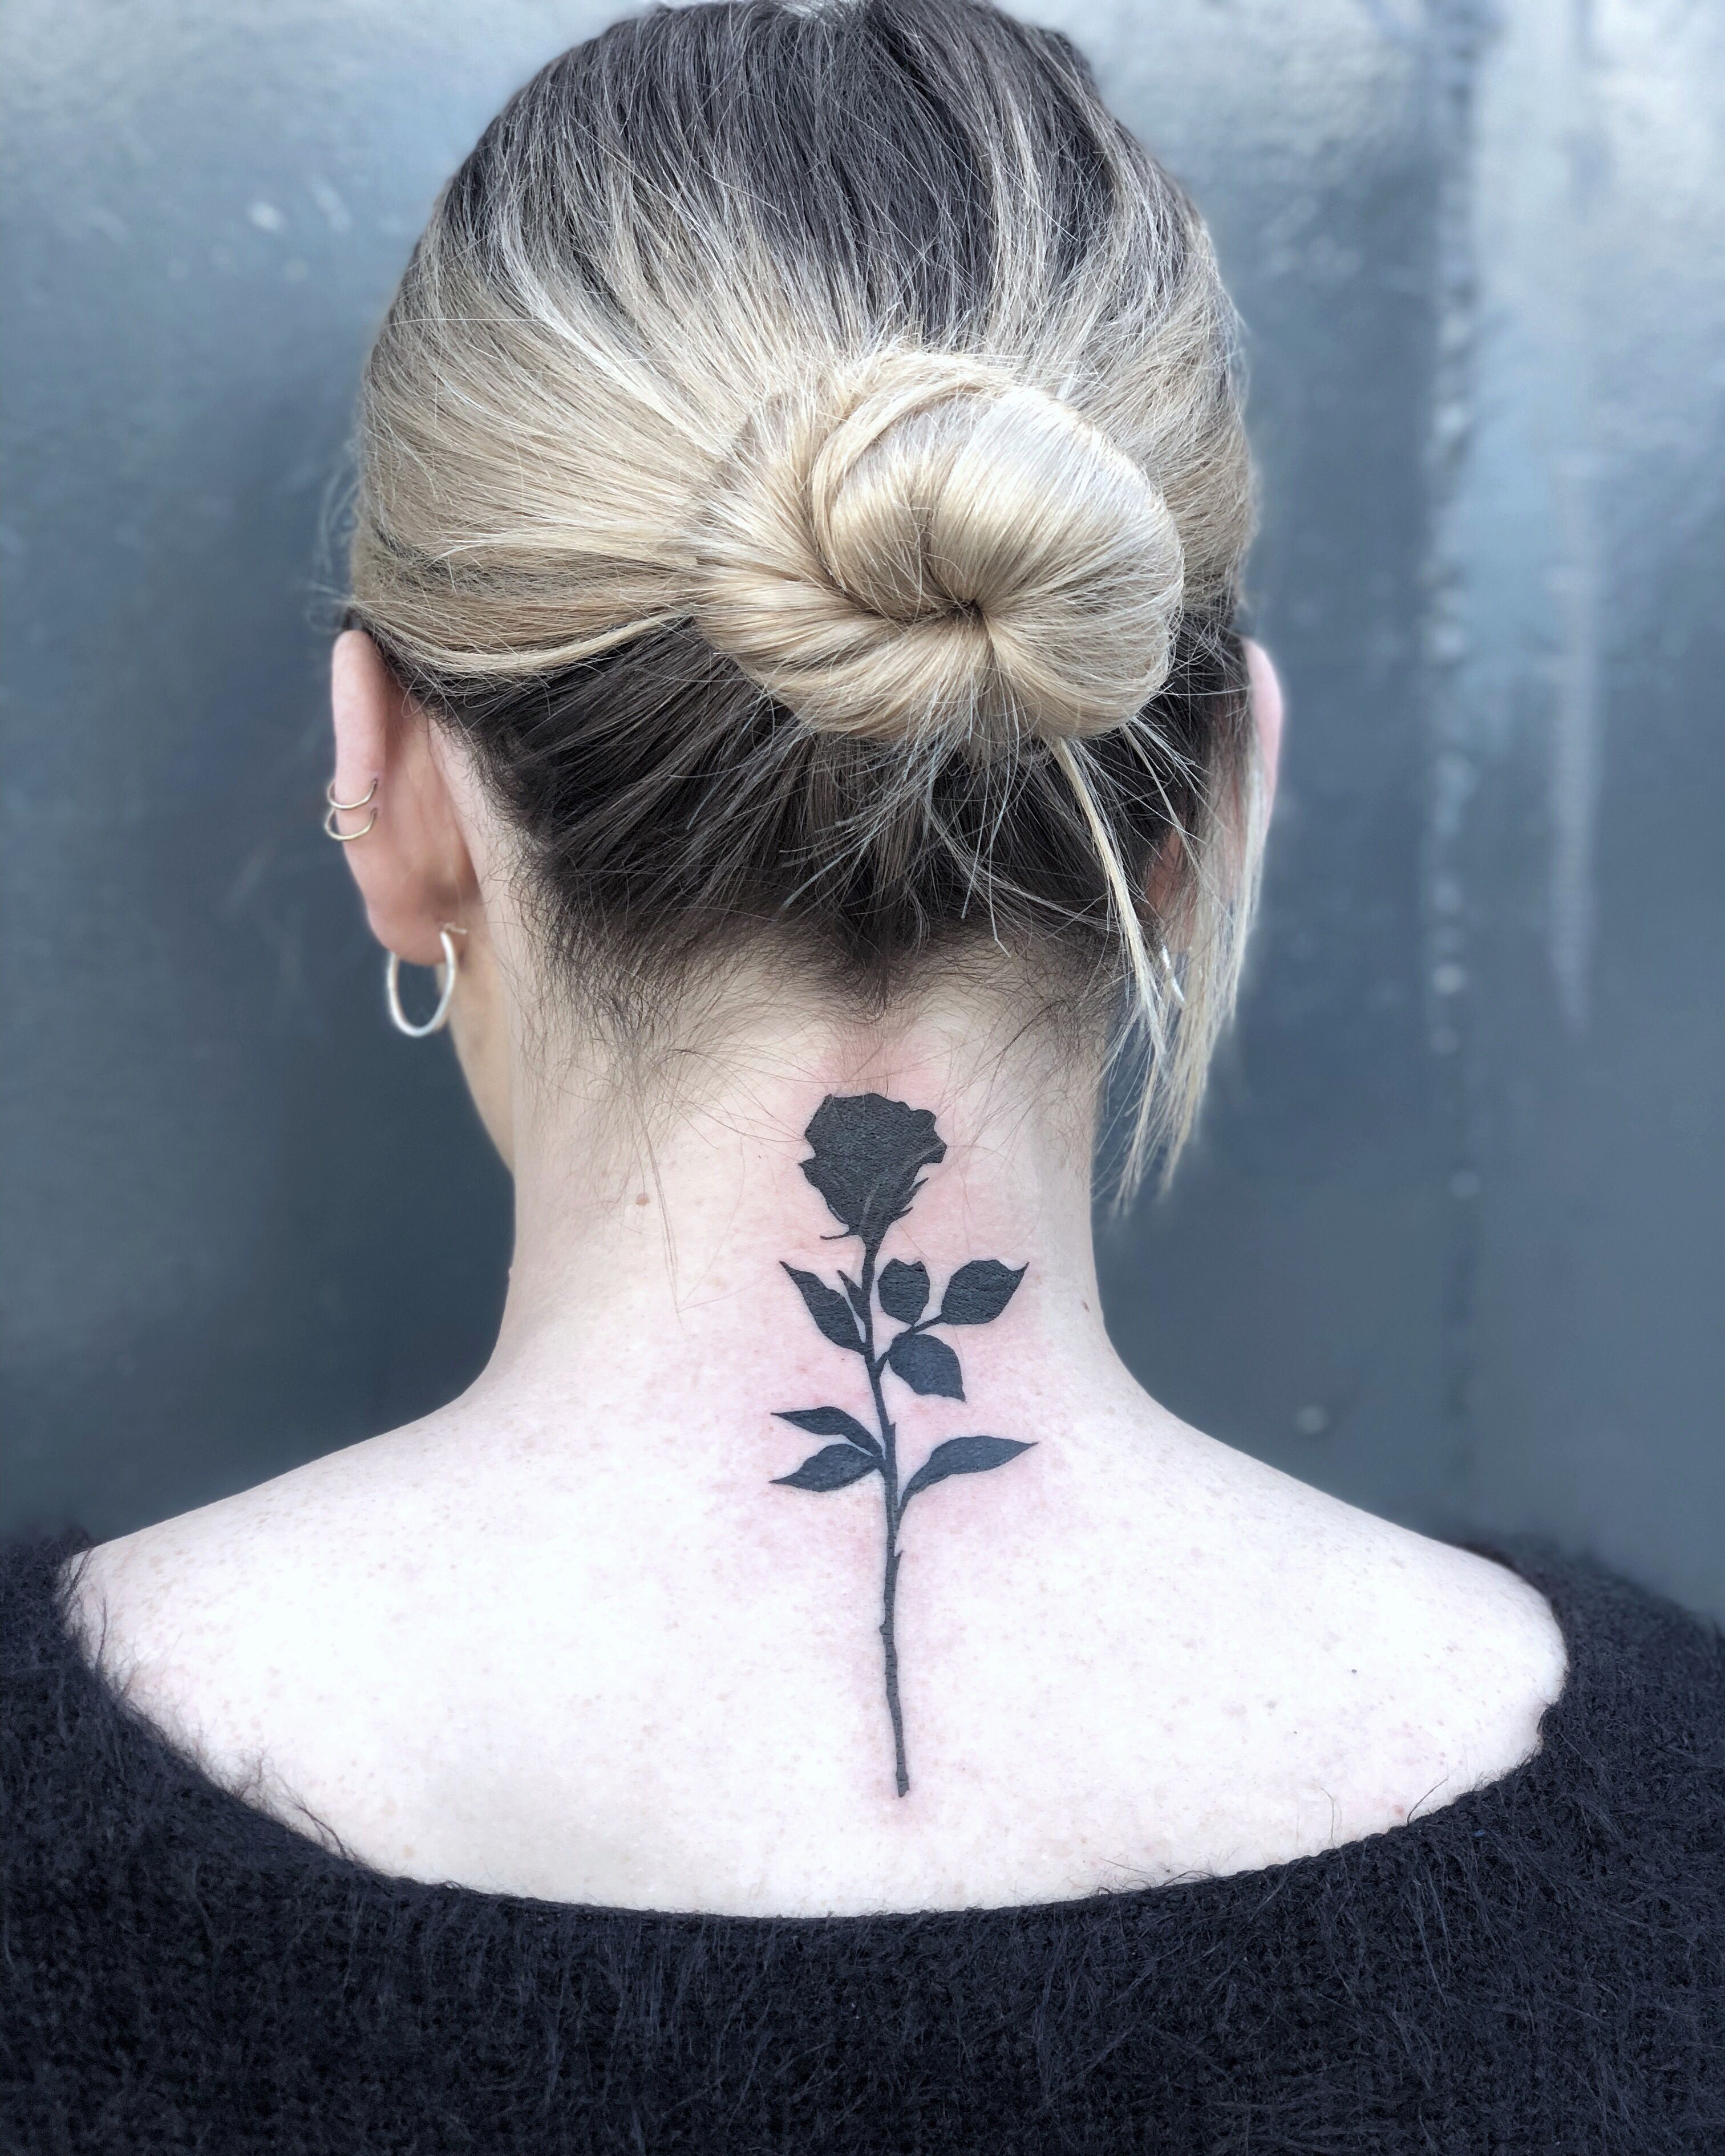 Rose silhouette tattoo | Black rose tattoos, Rose tattoo ...